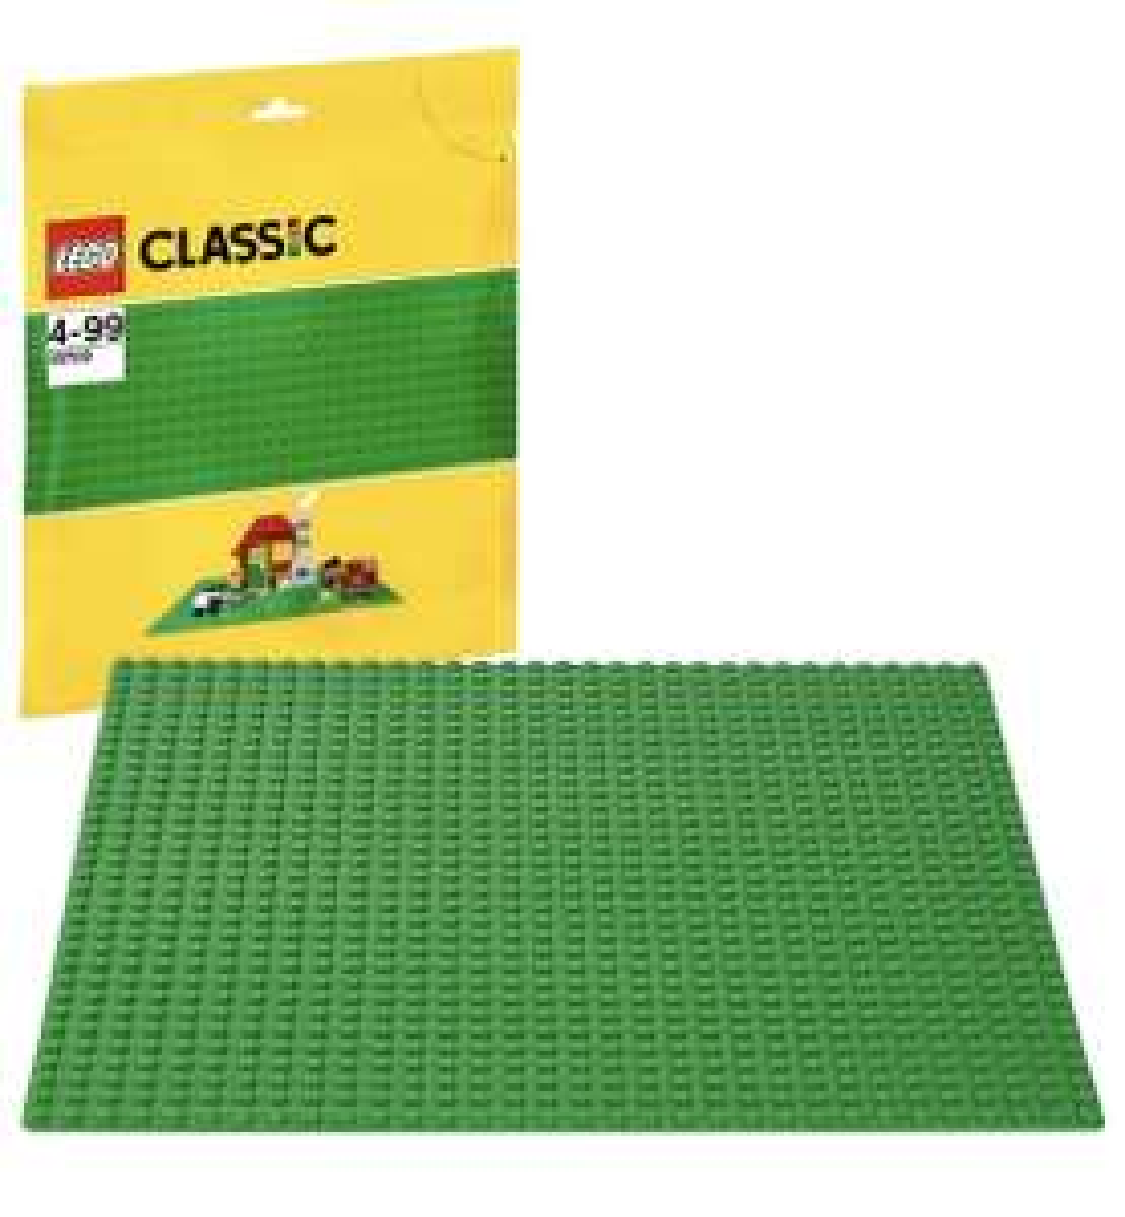 [PRIME] Lego Classic Bauplatte in Grün